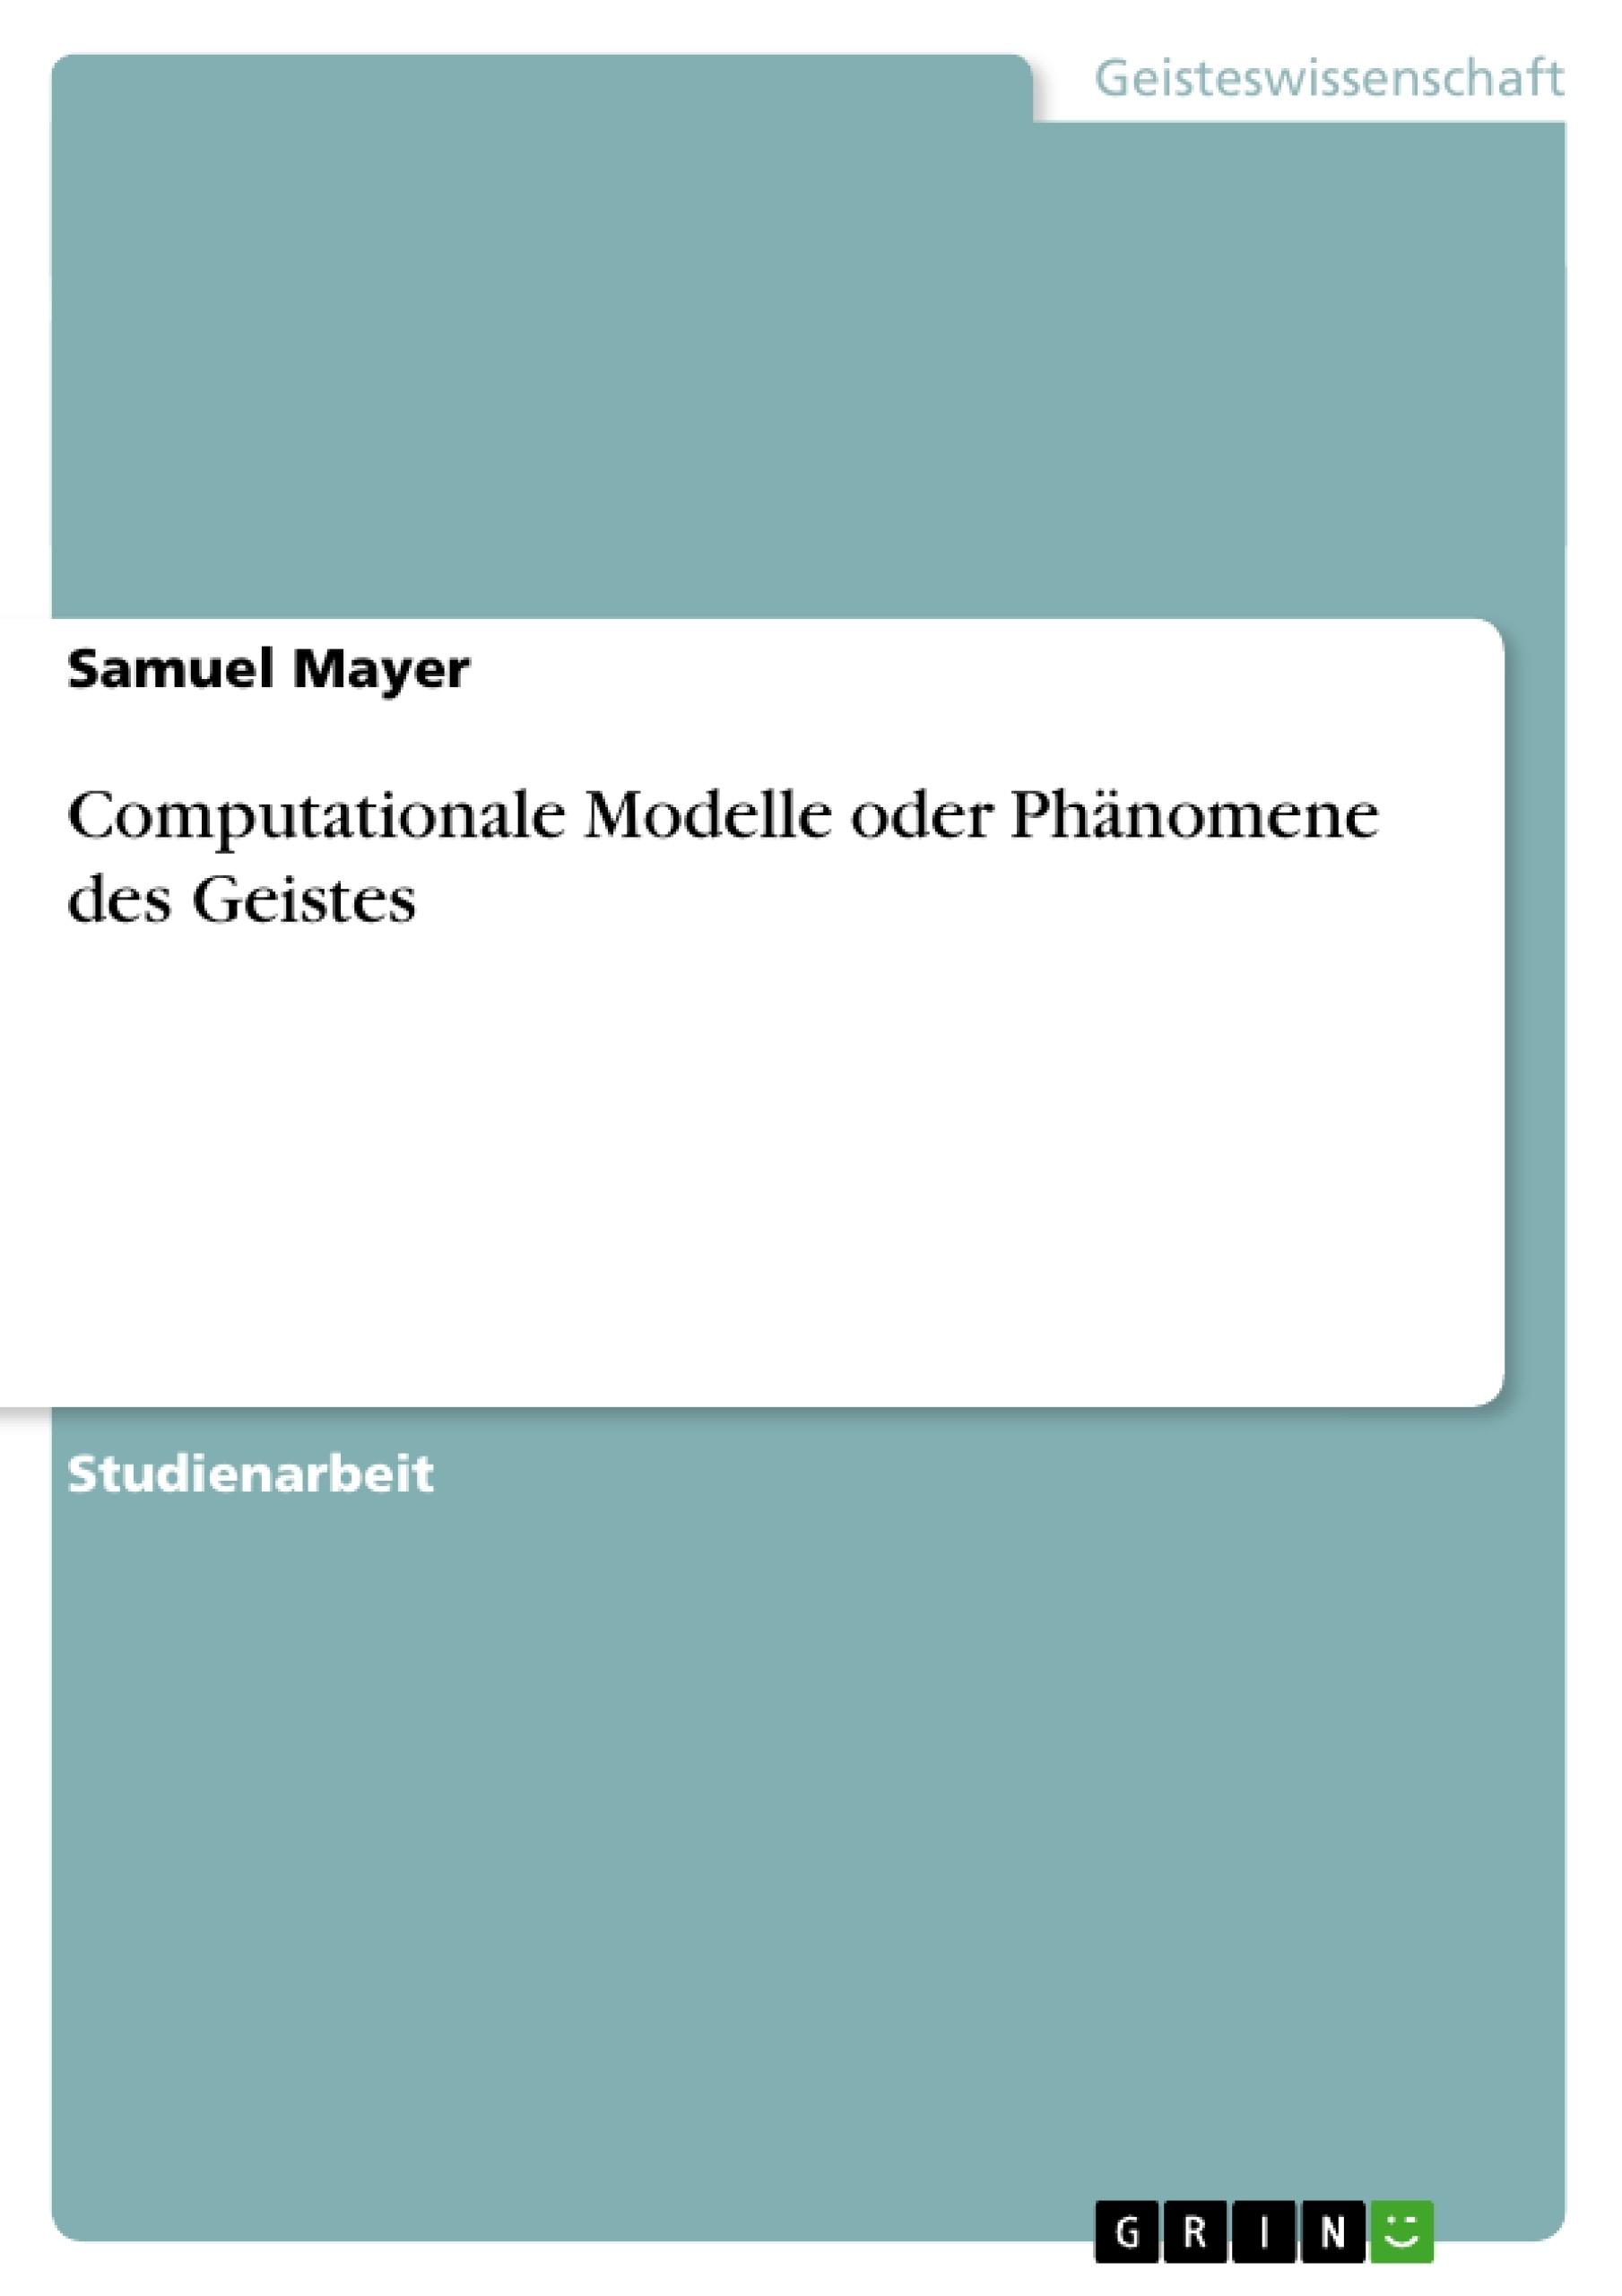 Titel: Computationale Modelle oder Phänomene des Geistes